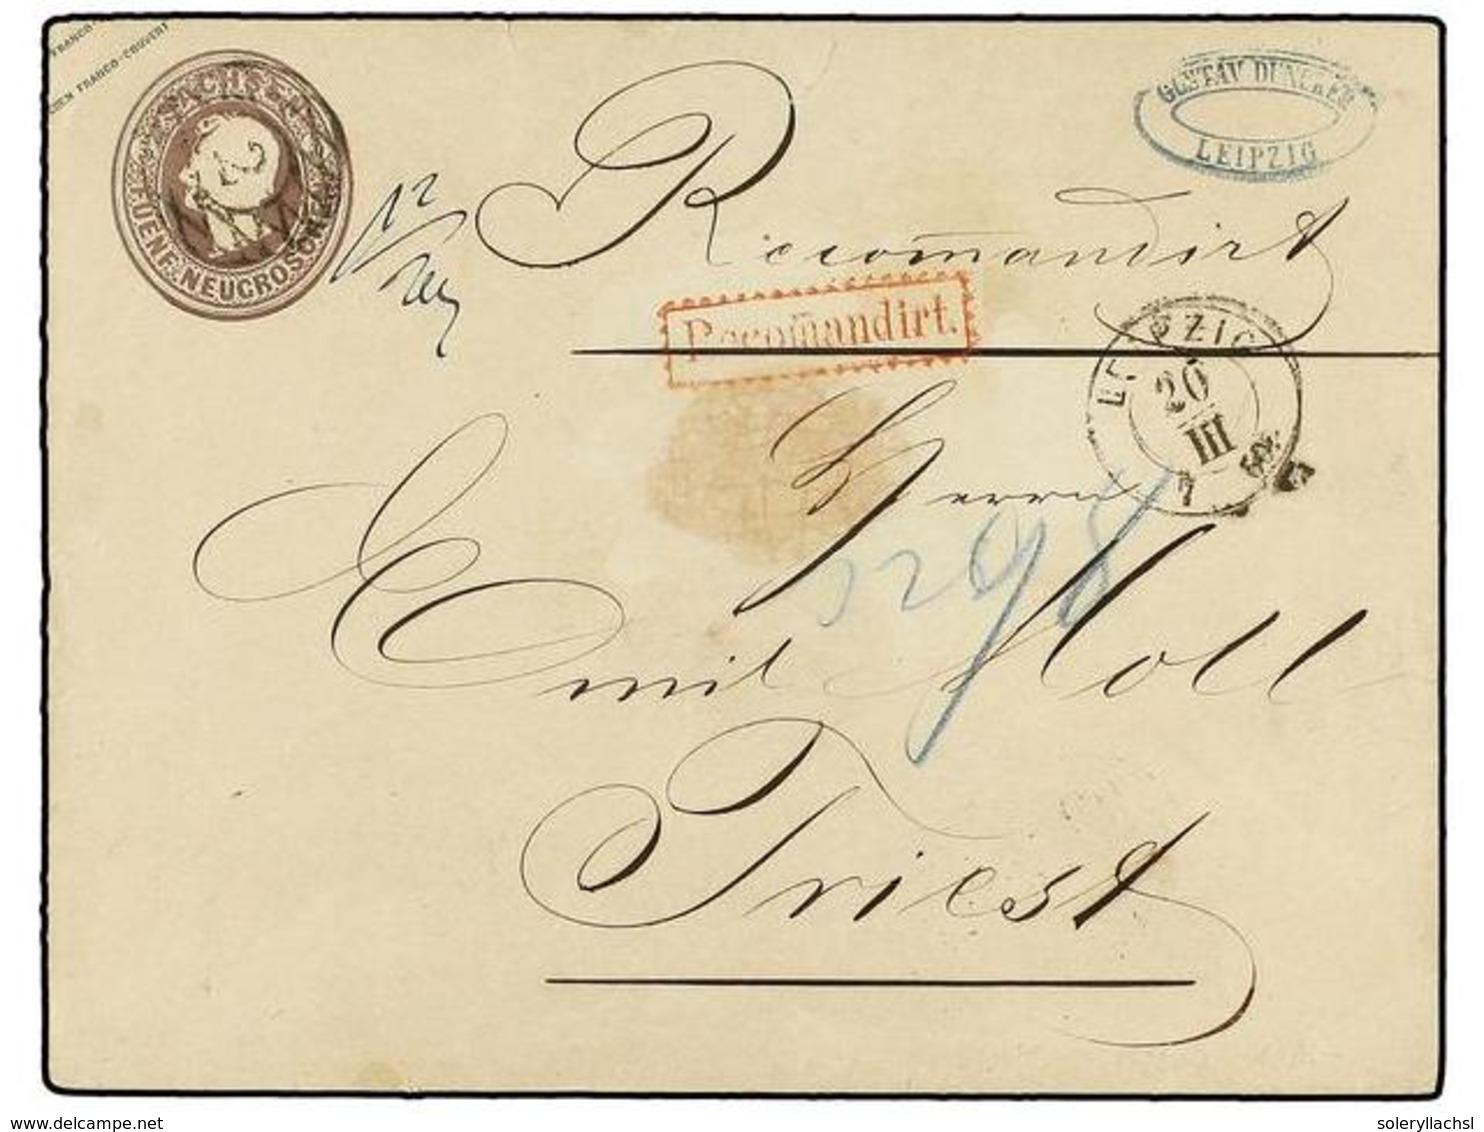 ALEMANIA ANTIGUOS ESTADOS: SAJONIA. 1860. LEIPZIG To TRIEST (Austria). 5 Ngr. Brown Envelope Sent Registered Tied By Ova - Zonder Classificatie